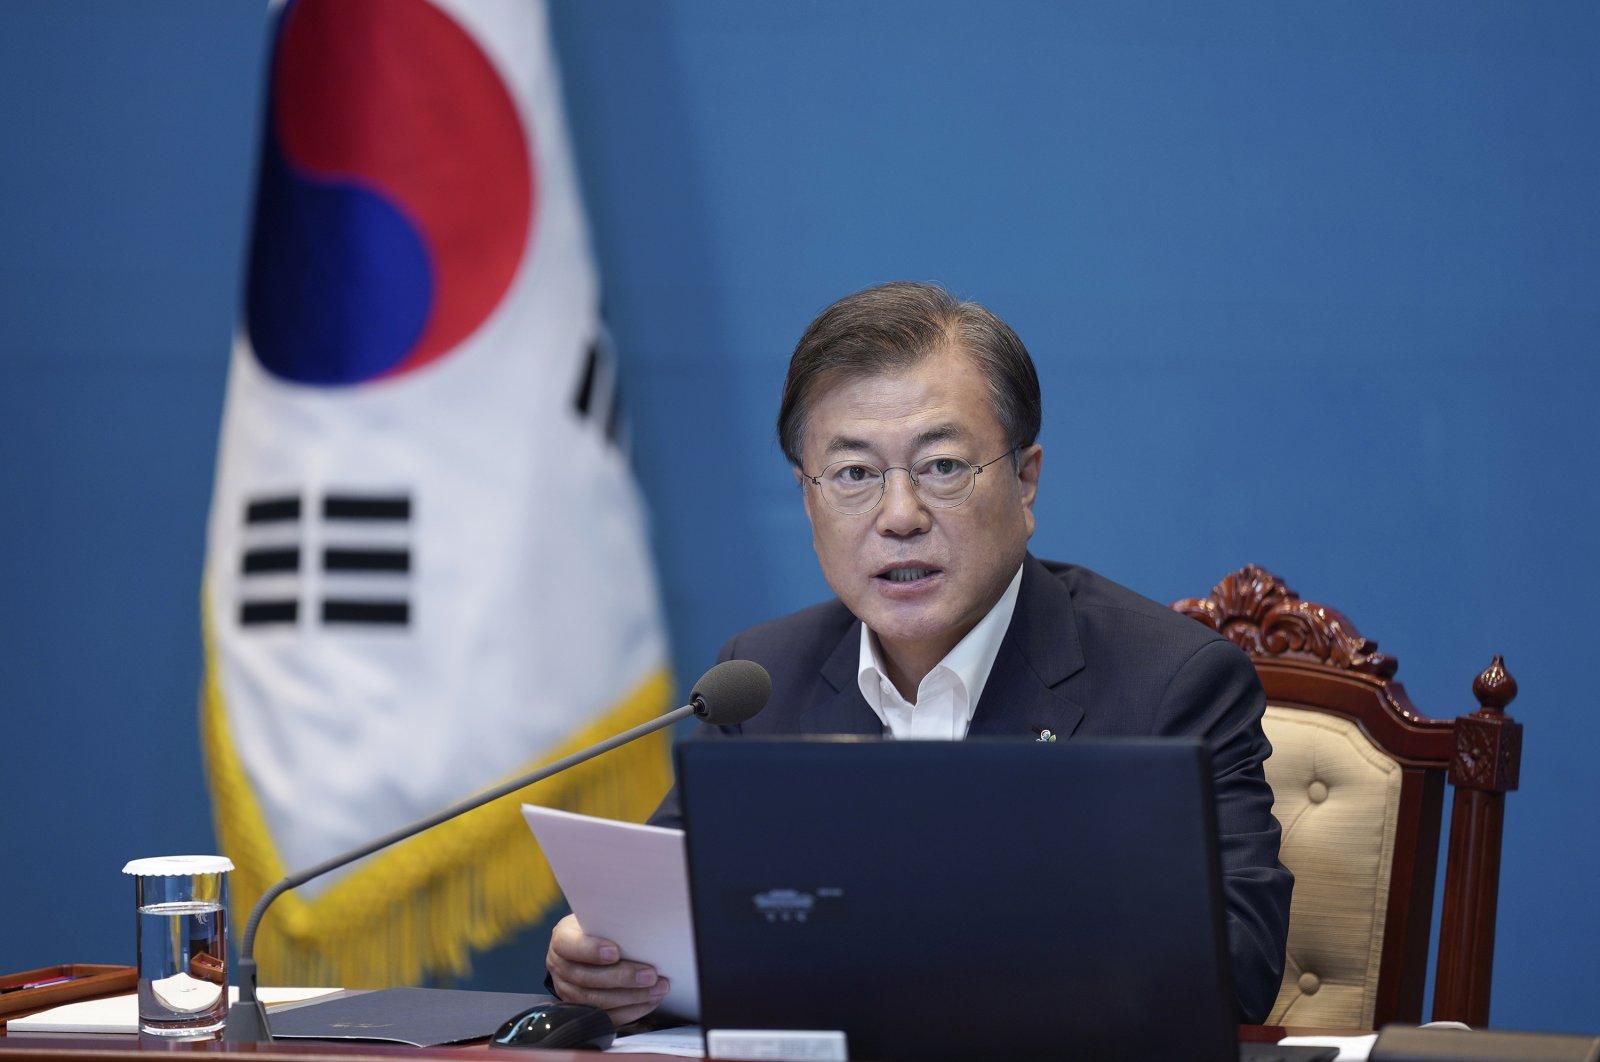 South Korean President Moon Jae-in speaks during a meeting with top presidential advisers at the presidential Blue House in Seoul, South Korea, Monday, June 15, 2020. (AP Photo)